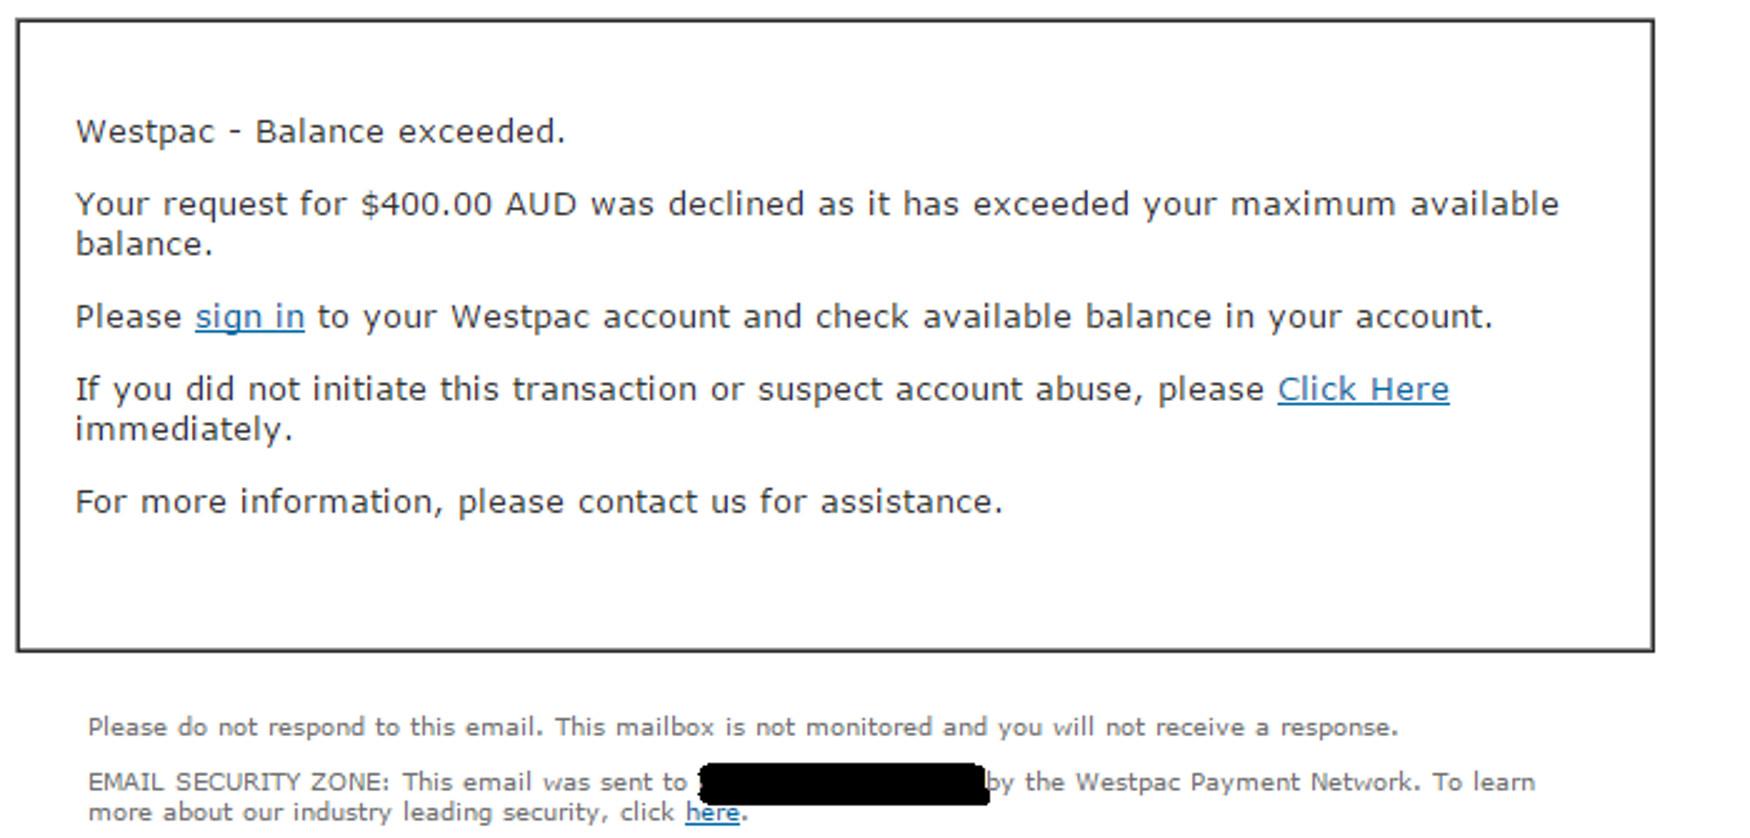 MailShark Latest phishing email mimics Westpac